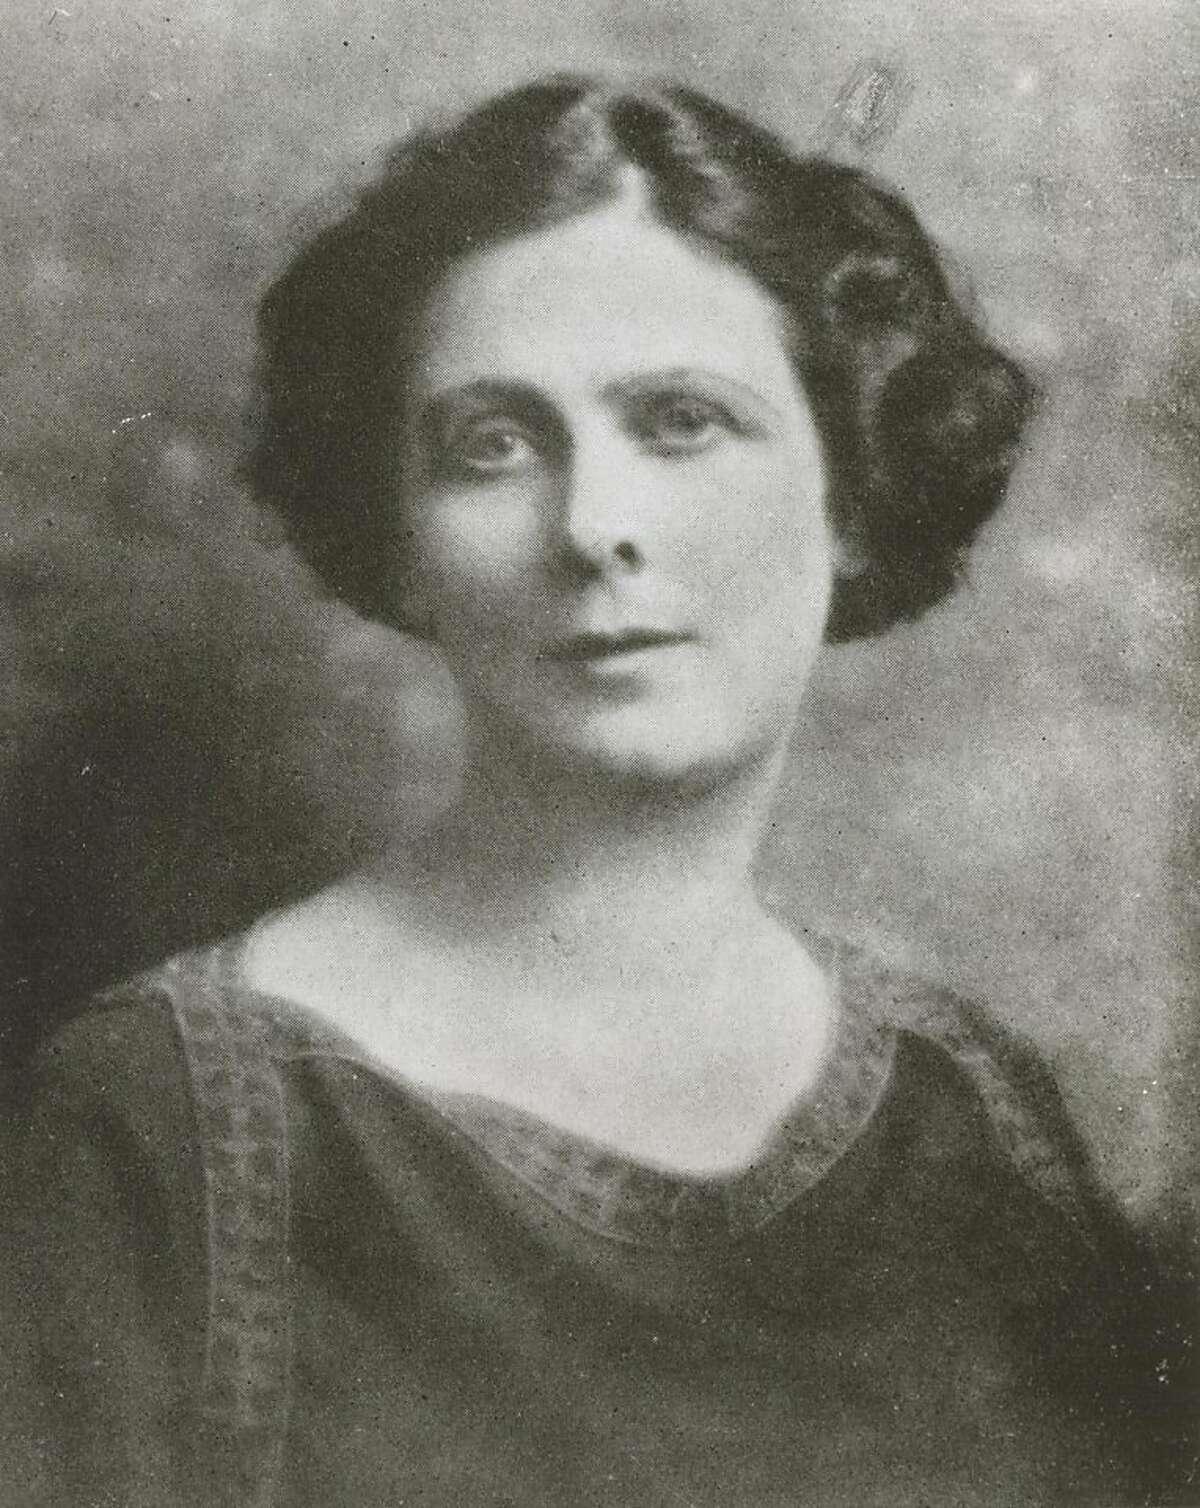 dance_144_2.jpg date unknown Isadora Duncan Ran on: 03-09-2009 Isadora Duncan made her dancing debut in 1890 in Oakland.